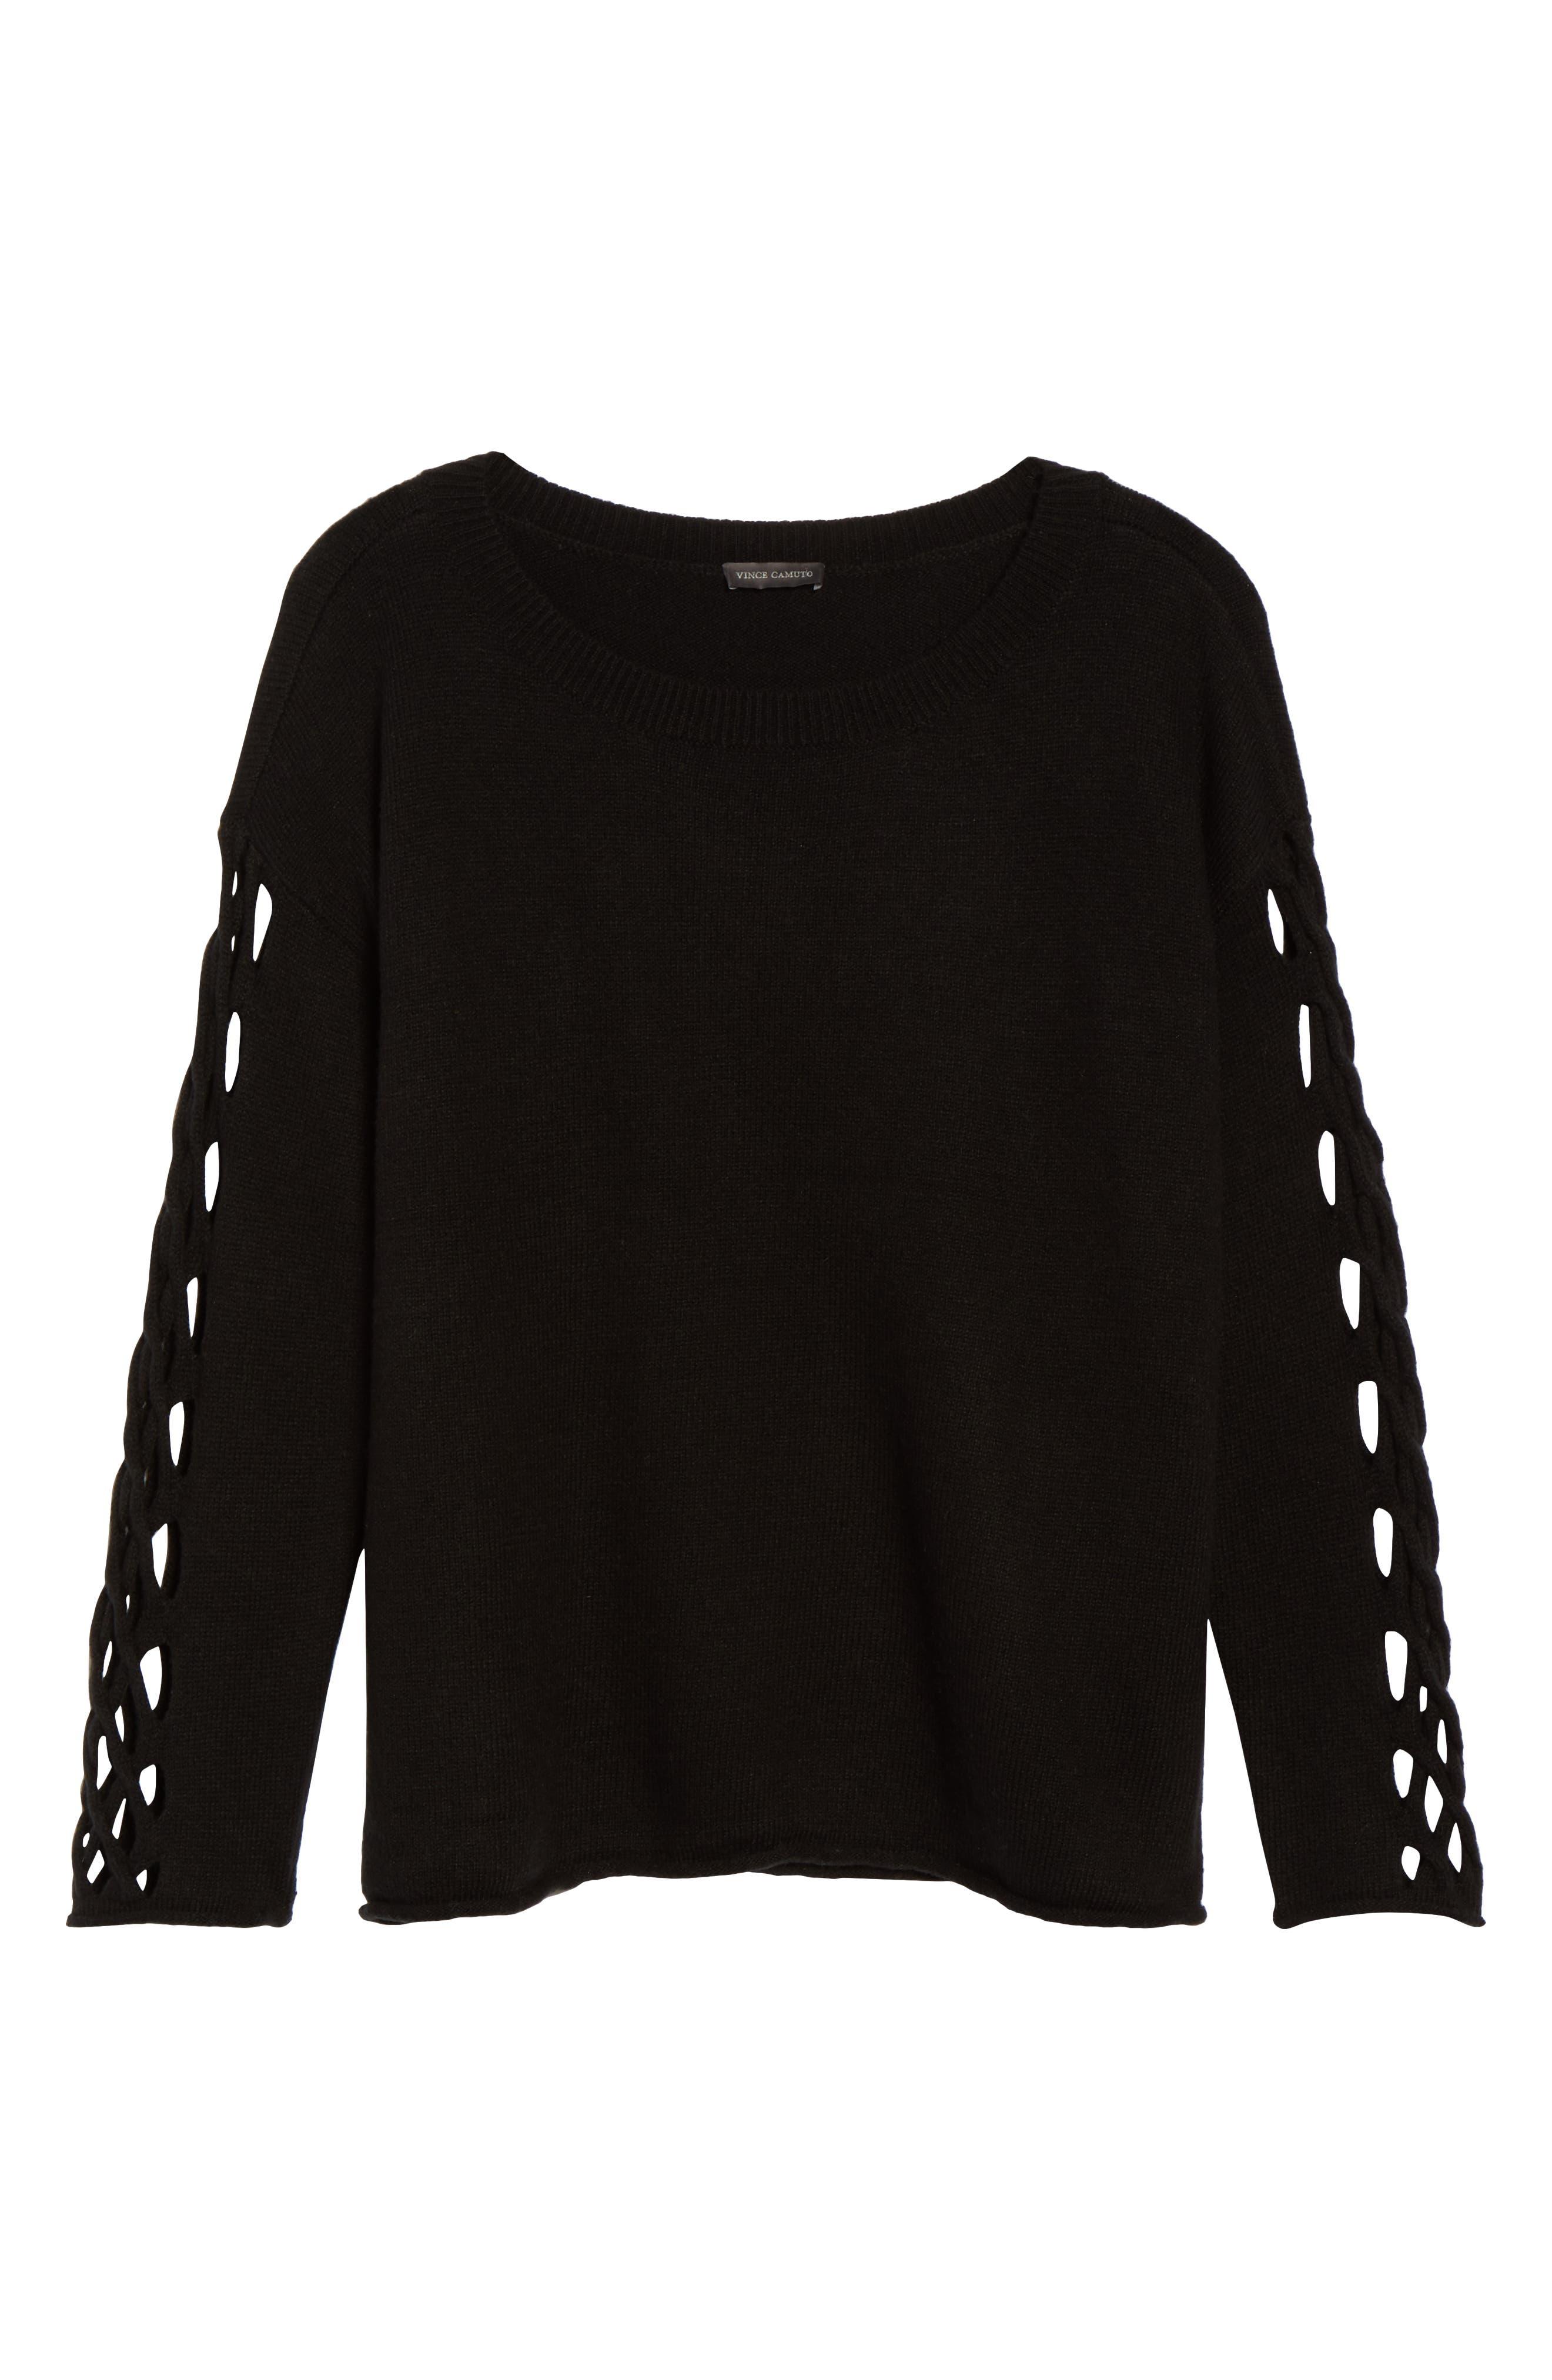 Braided Crewneck Sweater,                             Alternate thumbnail 6, color,                             011